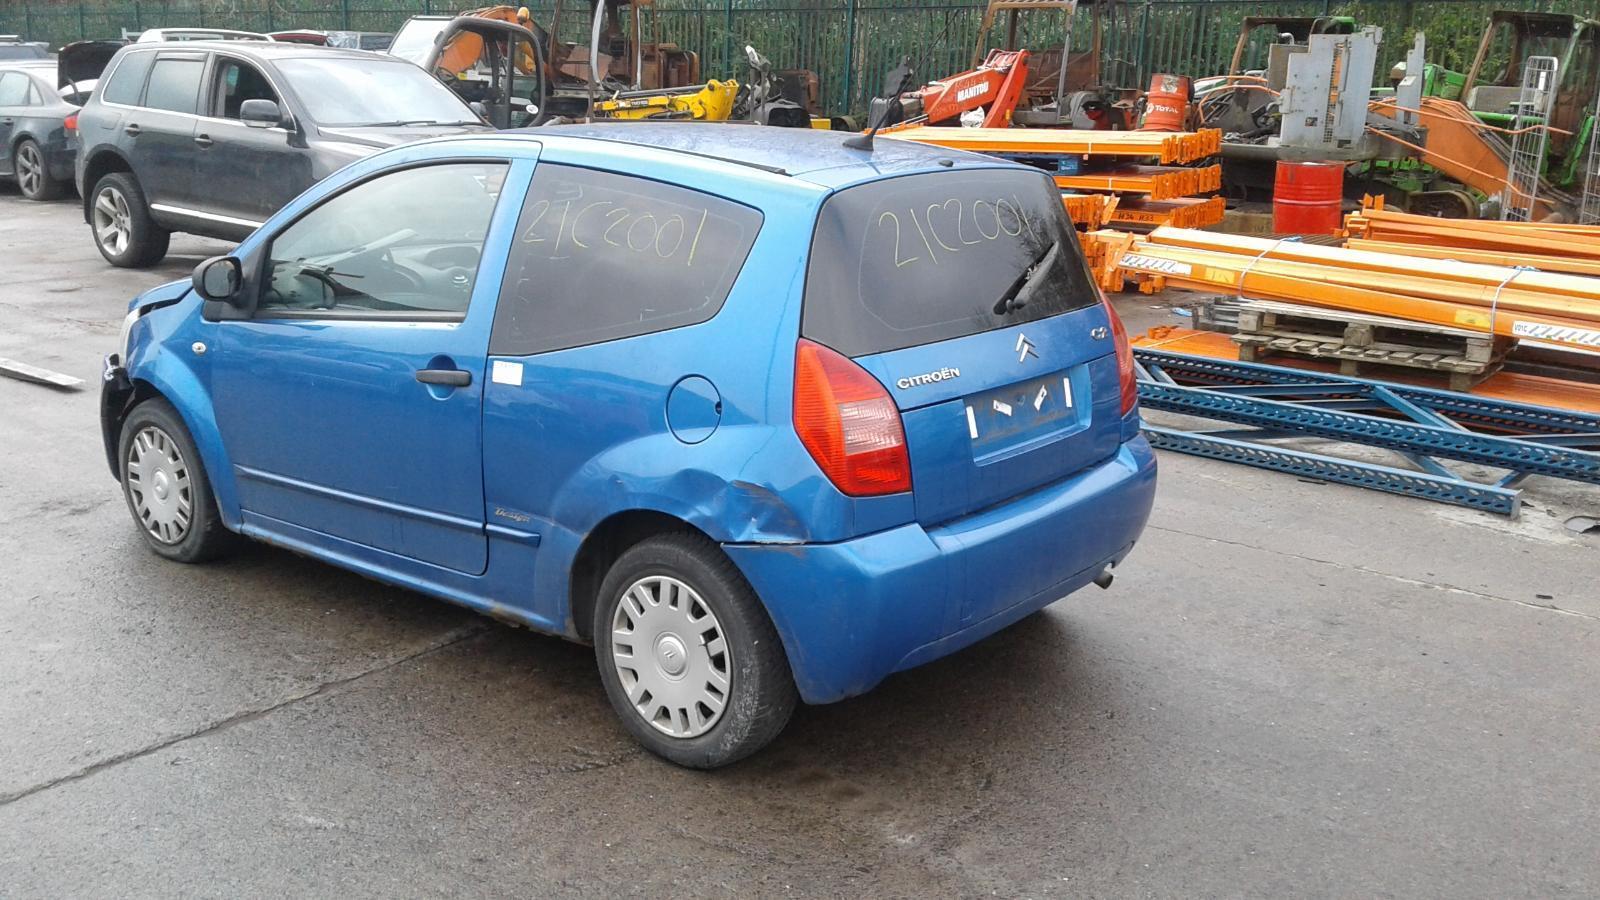 2005 CITROEN C2 Image